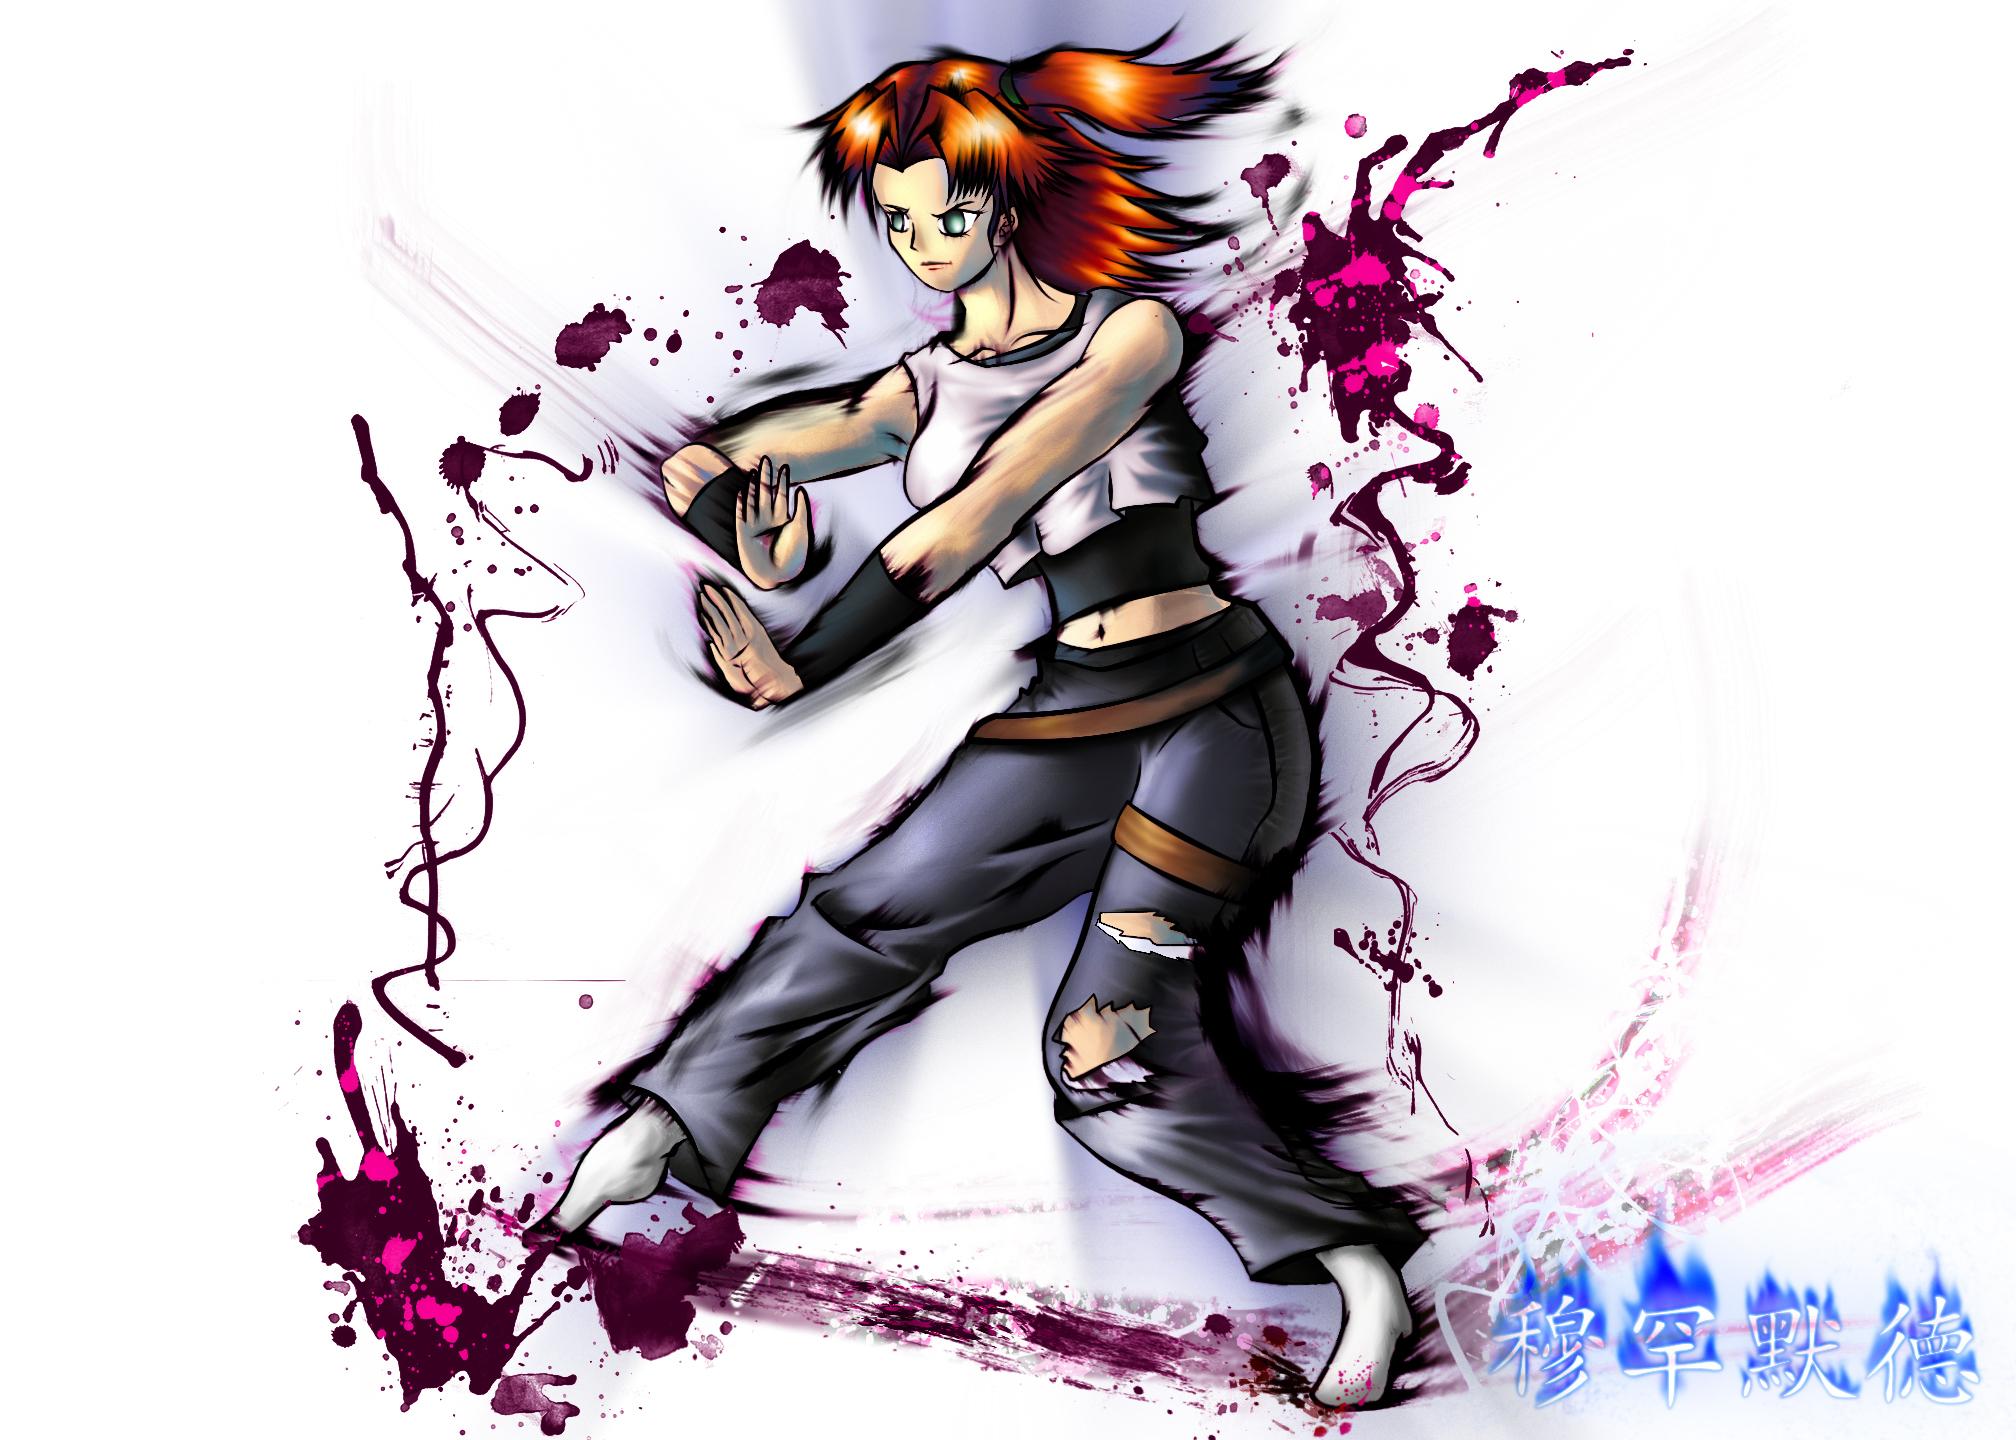 my_fighting_girl___inky_style_by_swordofdeath